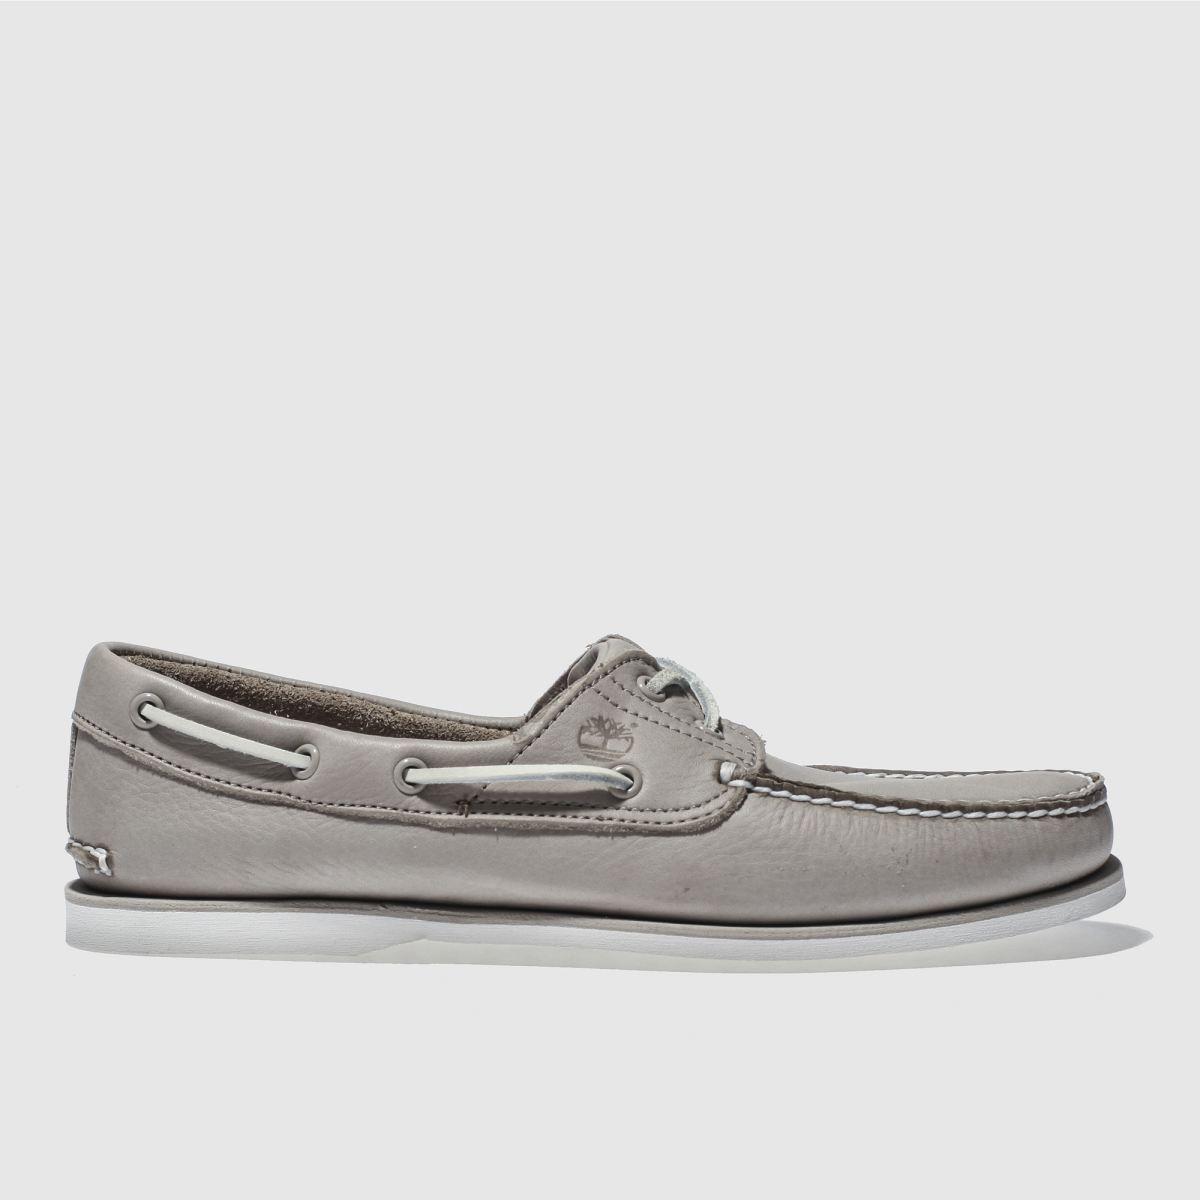 Timberland Light Grey Classic Boat 2 Eye Shoes